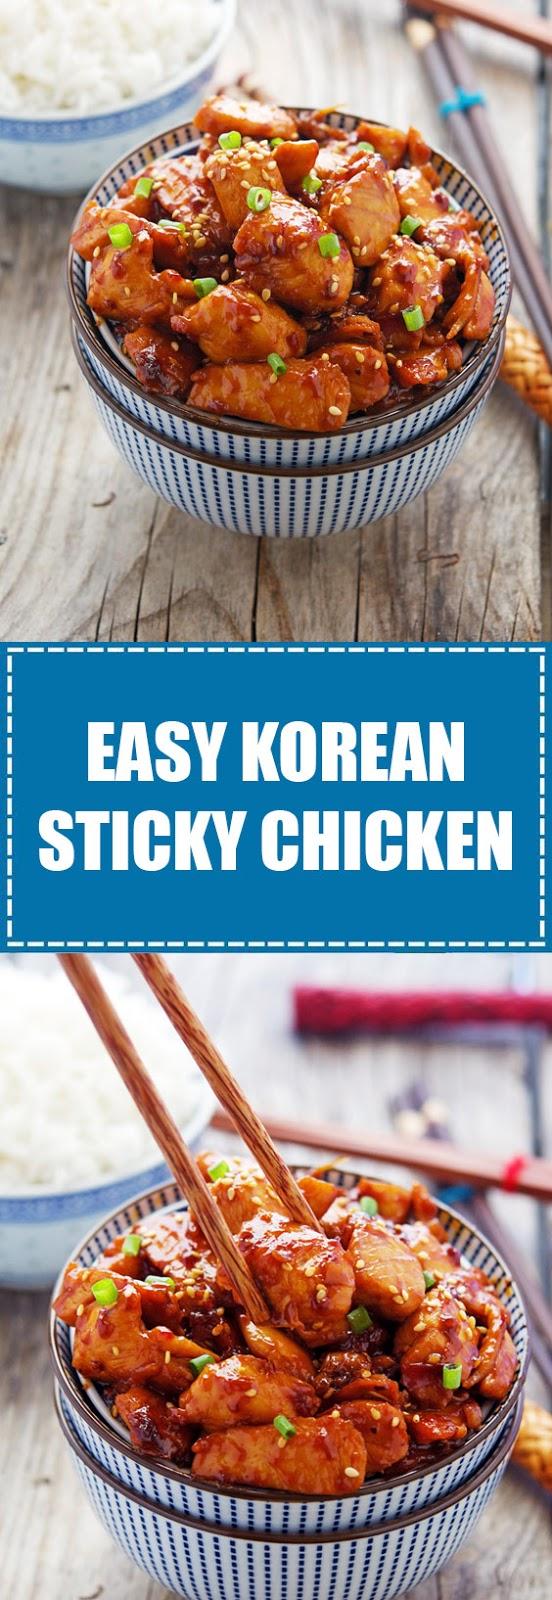 Easy Korean Sticky Chicken